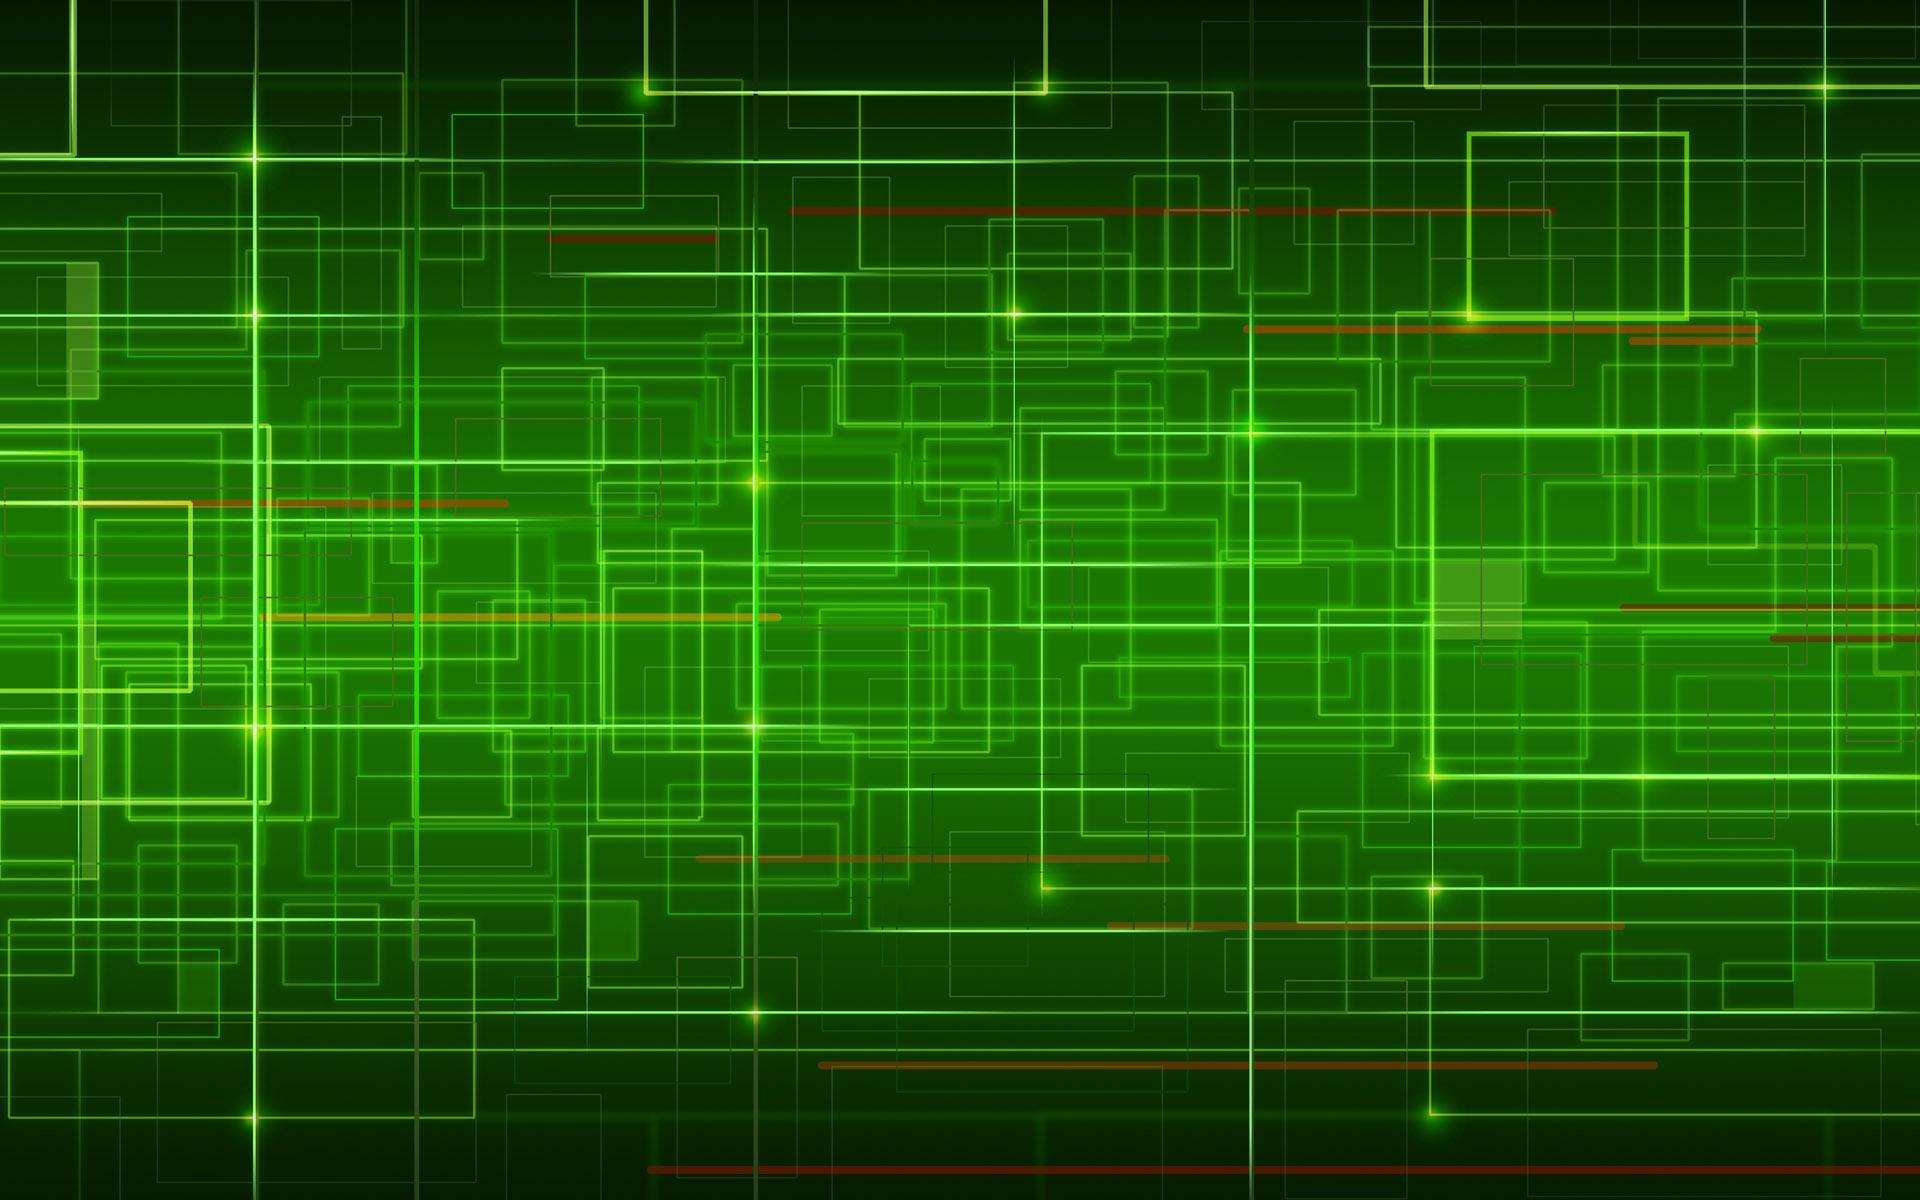 d4 wallpapers Go Green Wallpapers 1920x1200